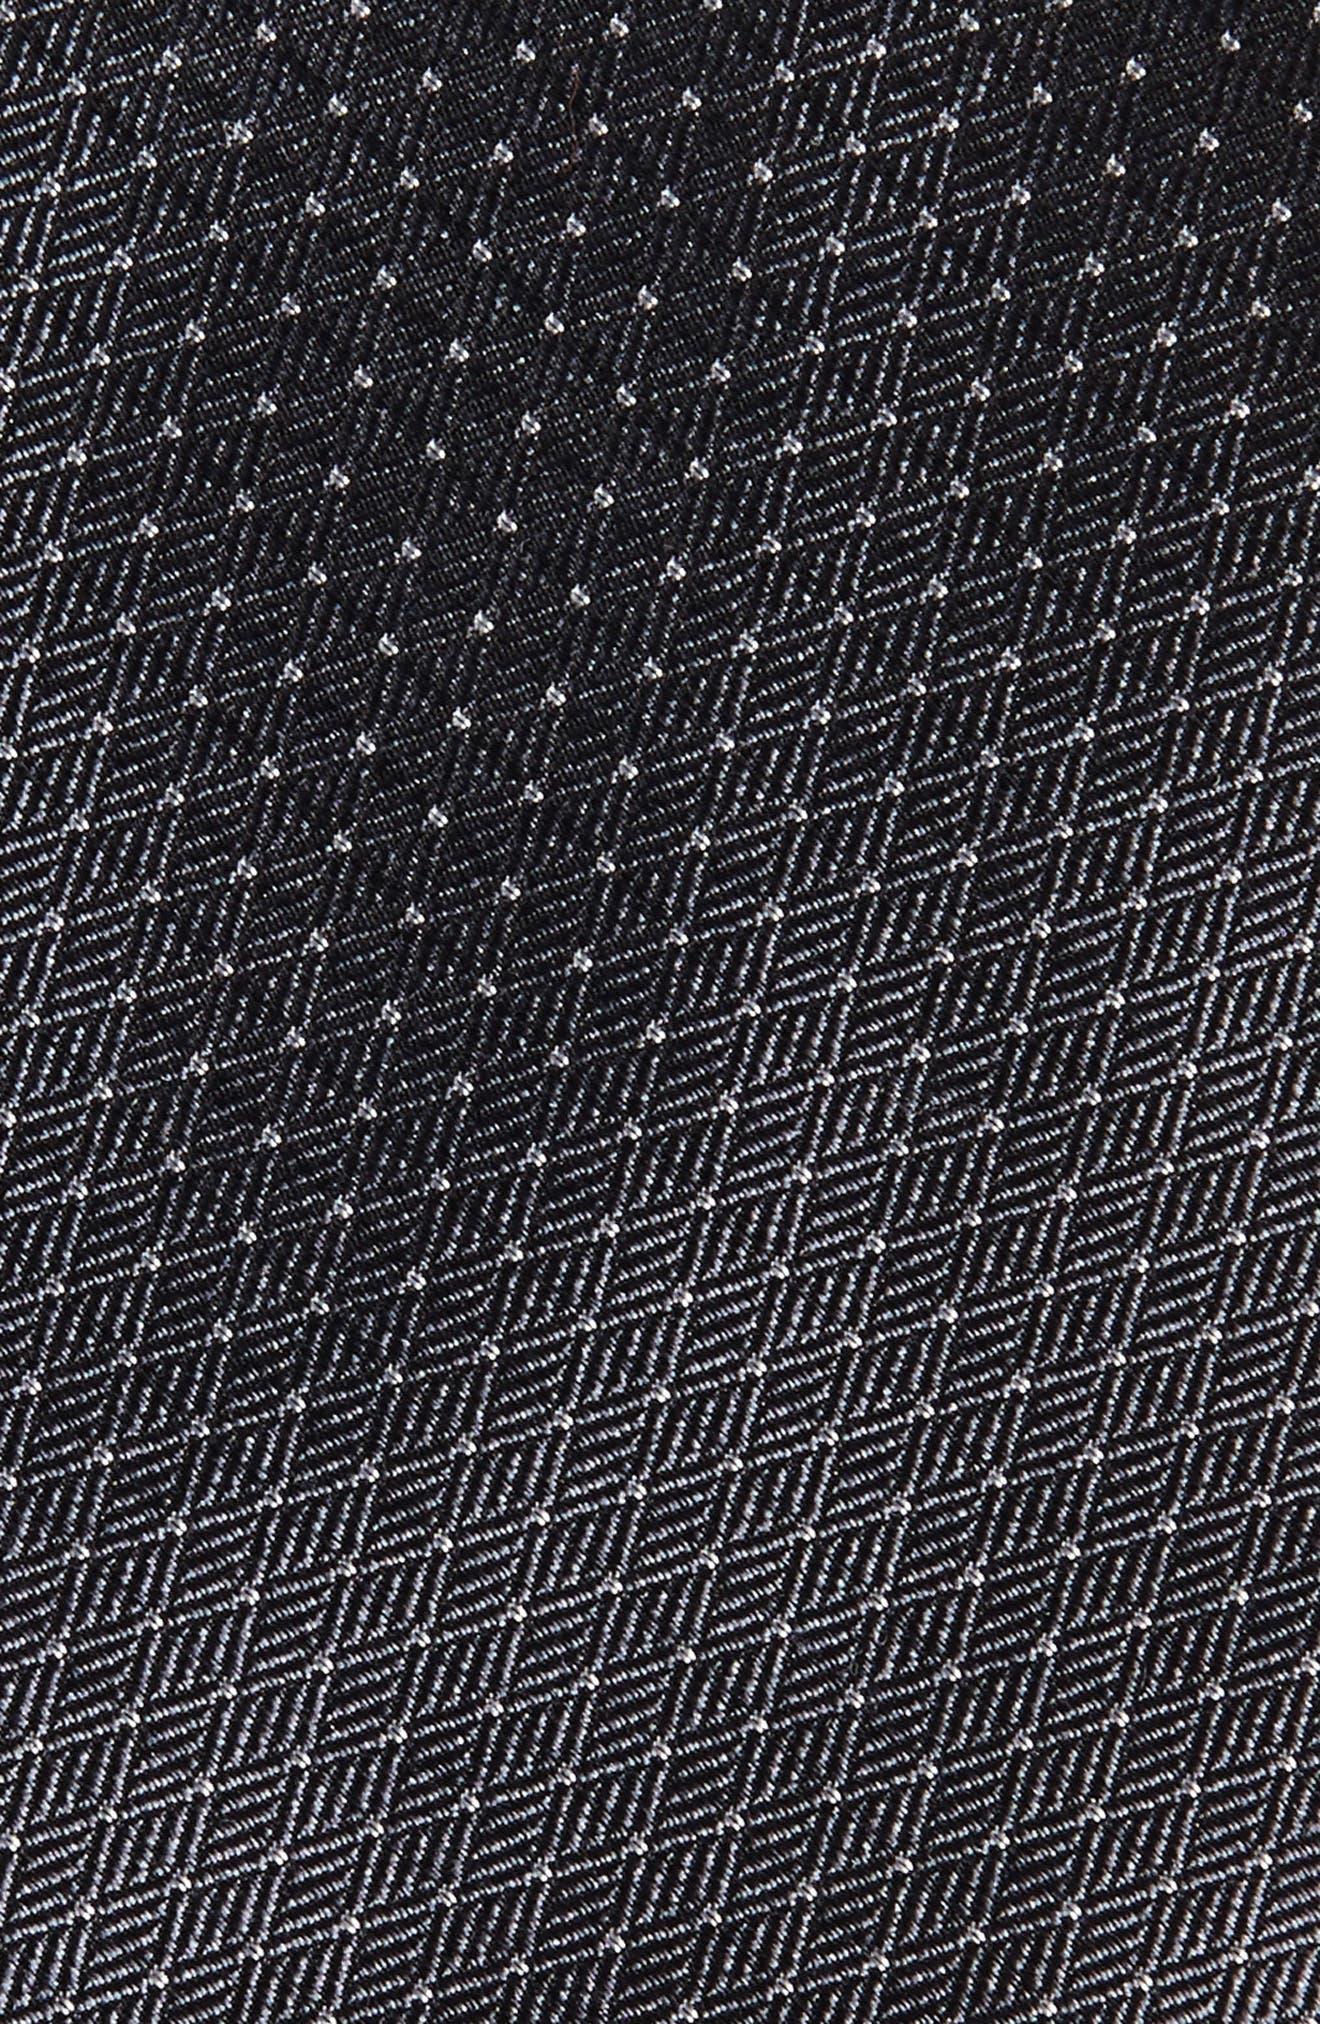 Parquet Pin Dot Silk Tie,                             Alternate thumbnail 2, color,                             020